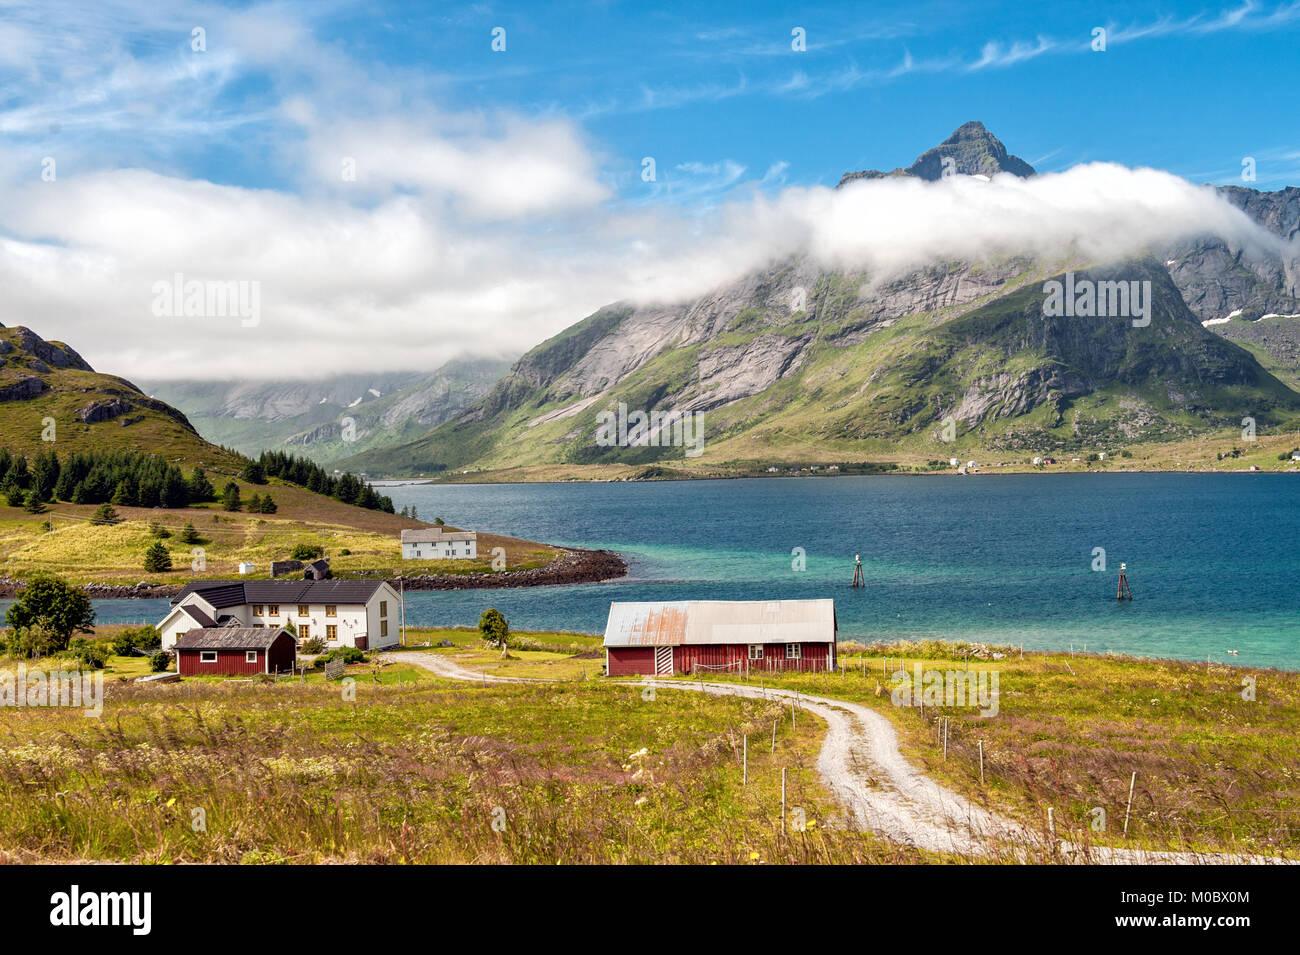 Traditional farm buildings in coast landscape on Lofoten islands in northern Norway. Lofoten is a popular tourist - Stock Image